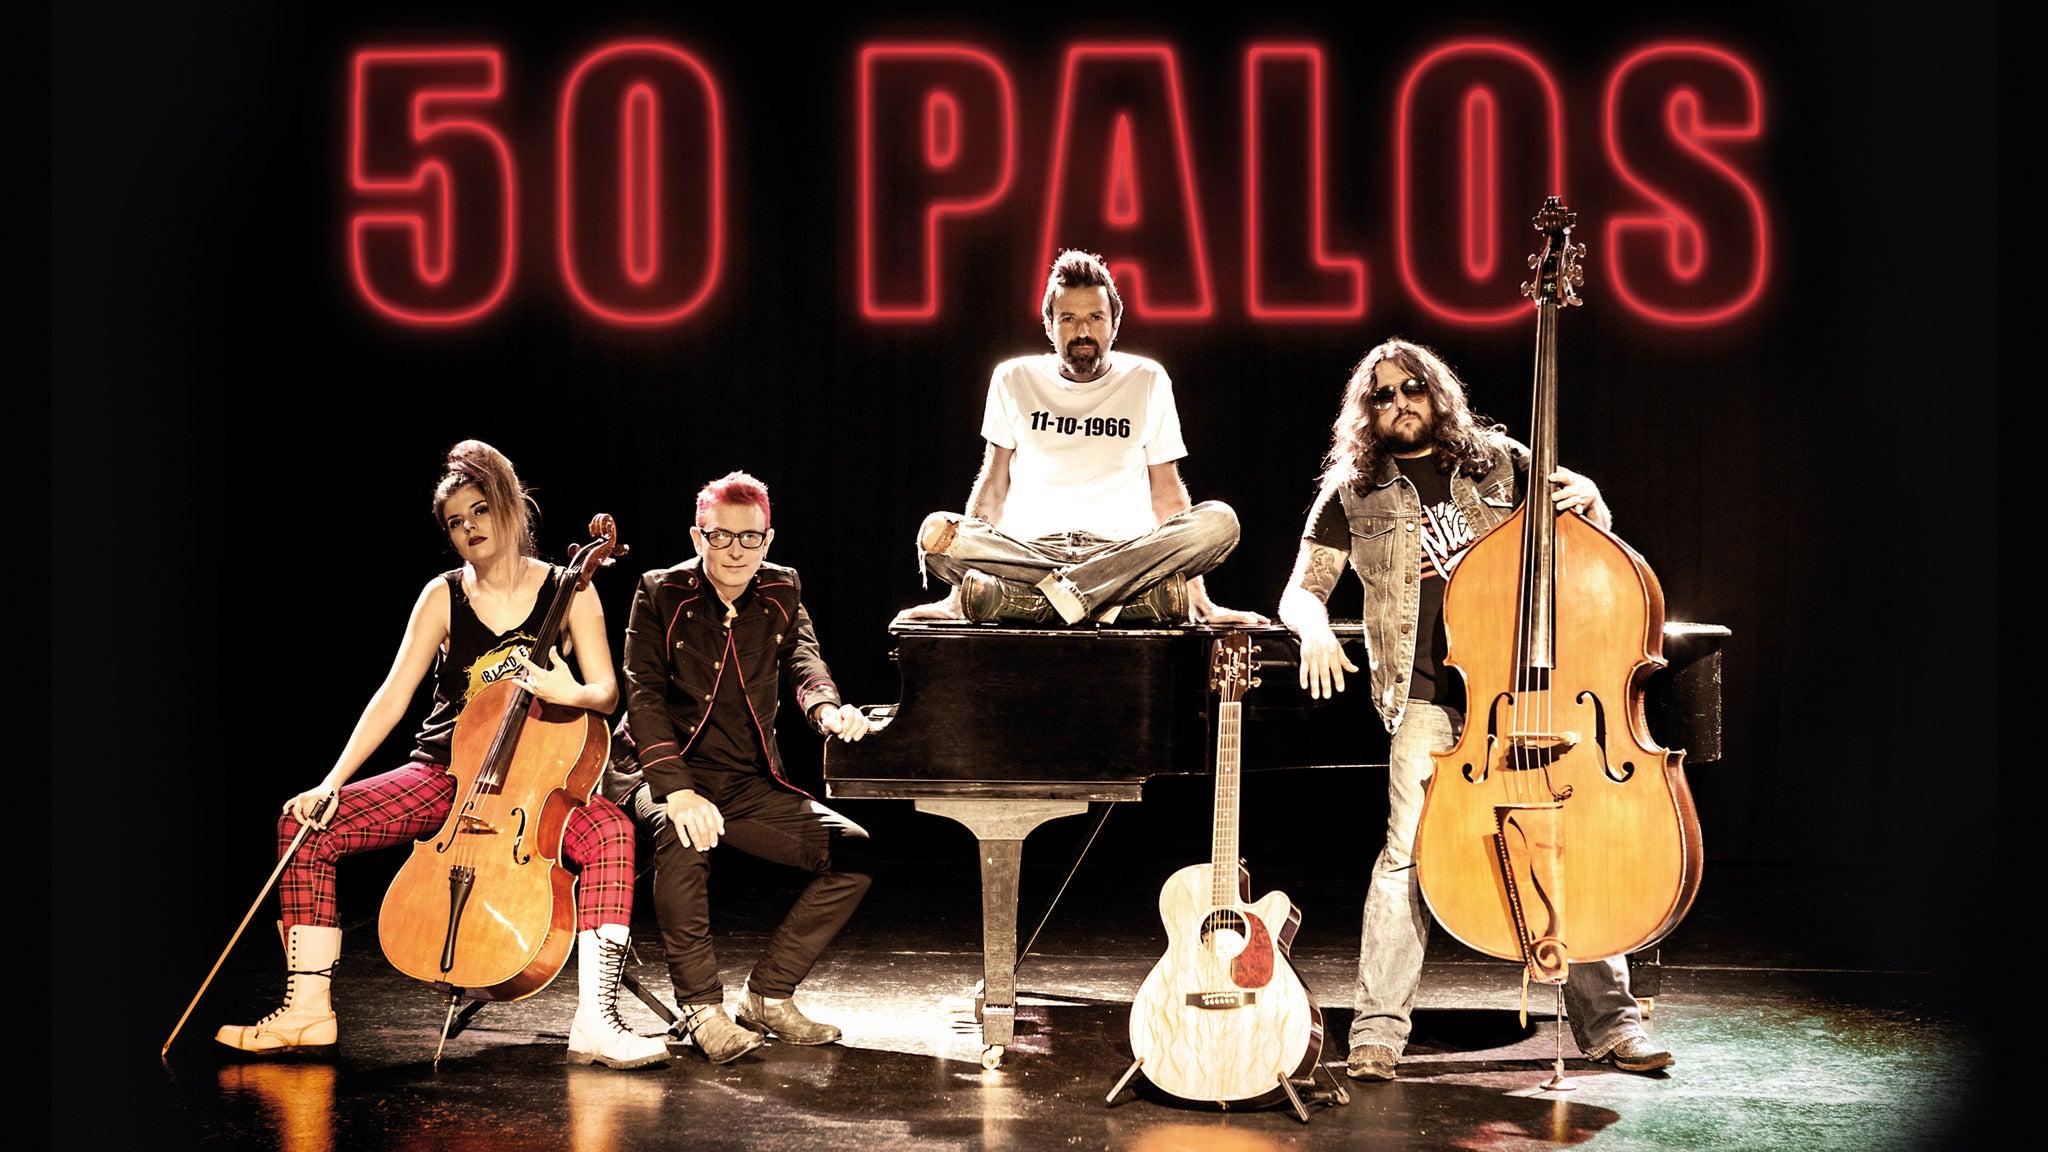 Mas Variedad 102.9FM presenta Jarabe de Palo